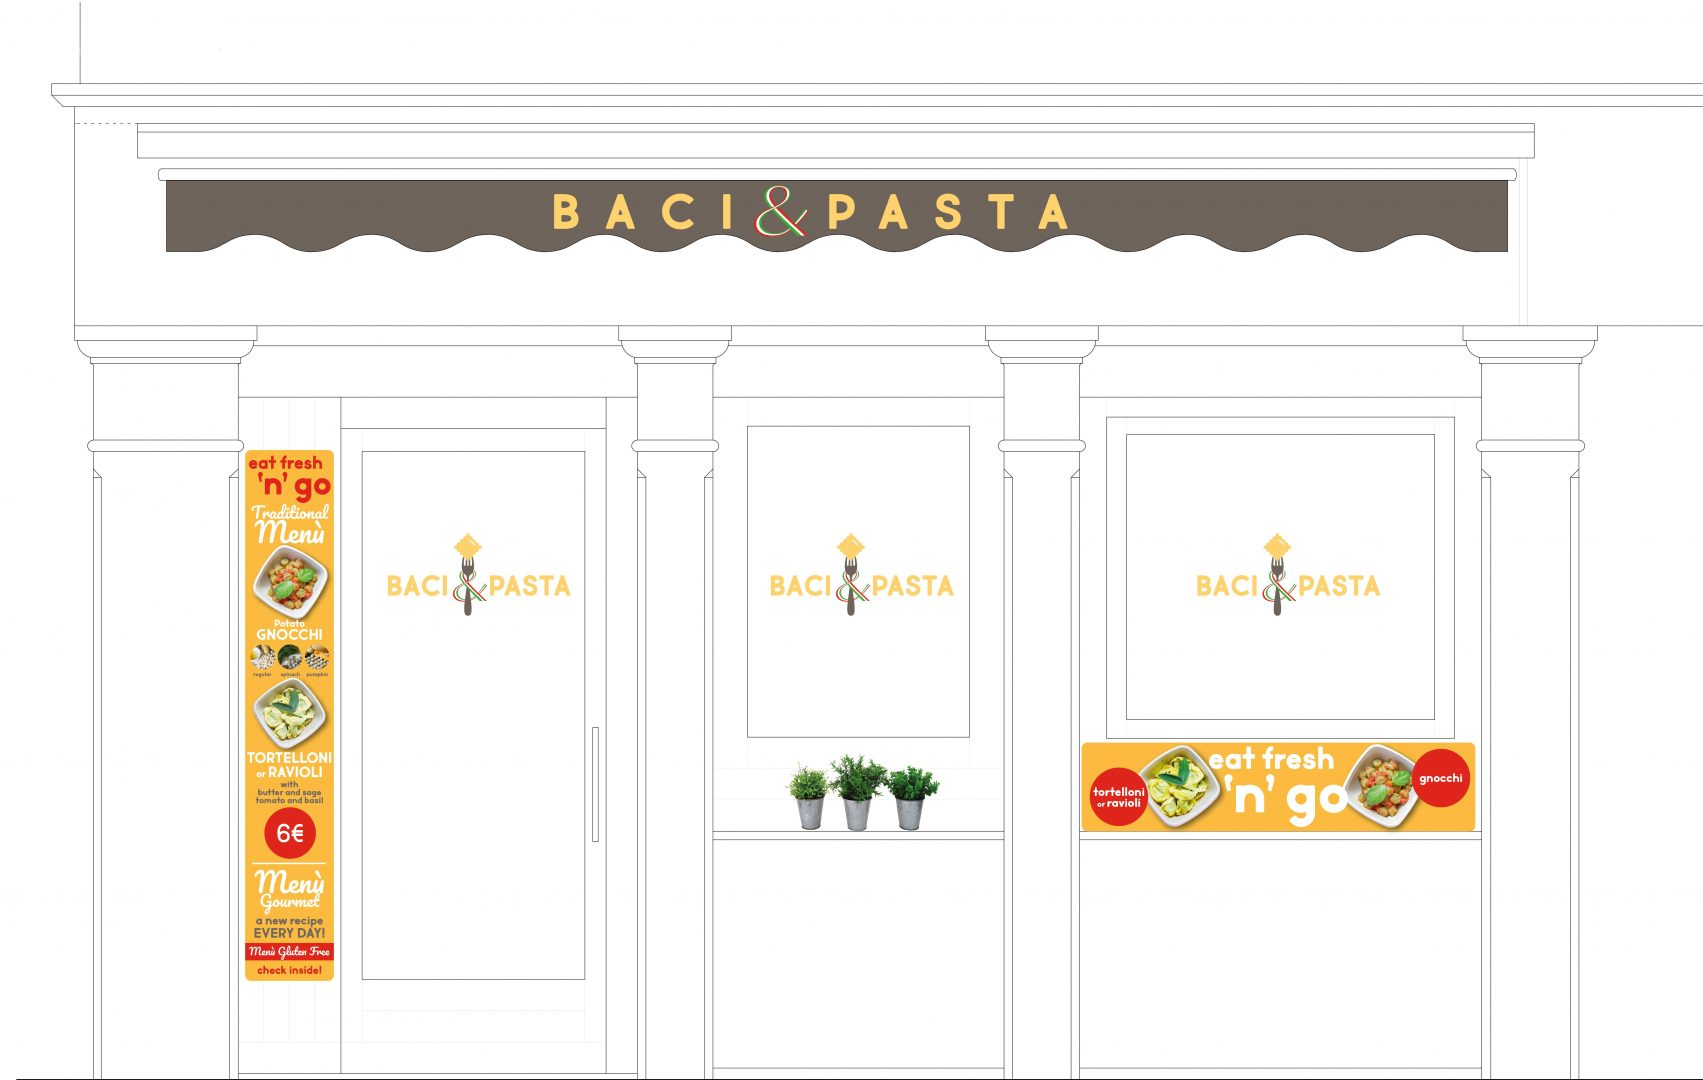 BACI & PASTA